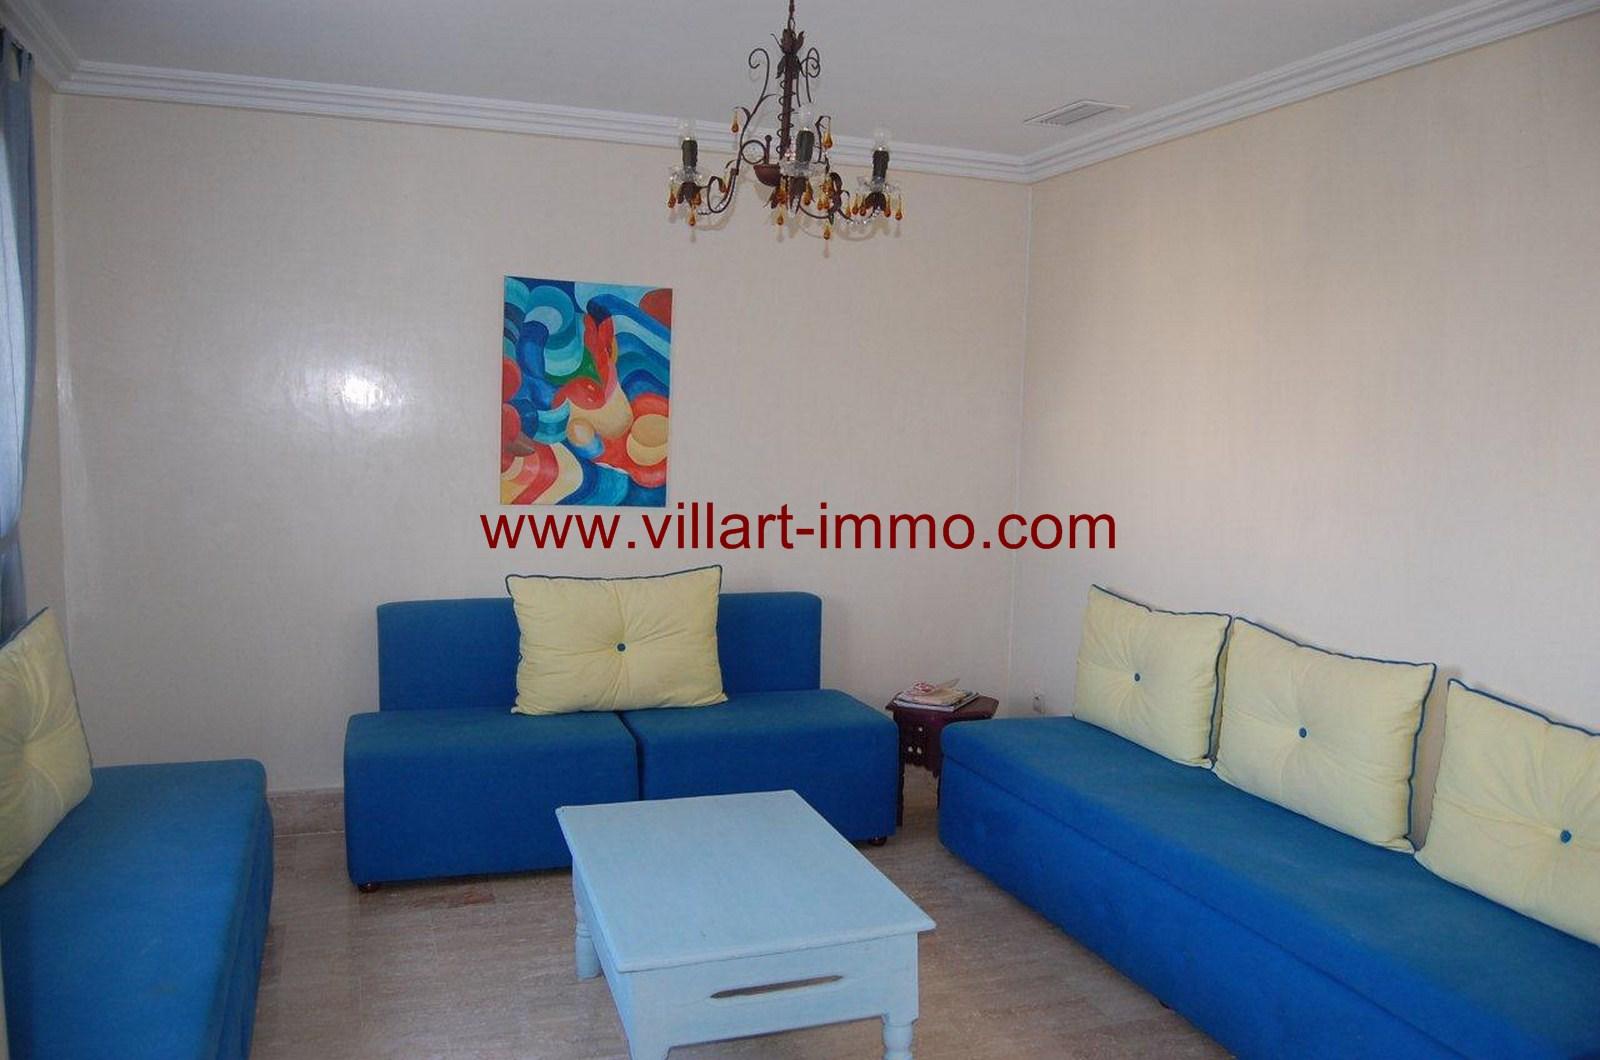 3-vente-appartement-tanger-achakar-salon-2-va389-villart-immo